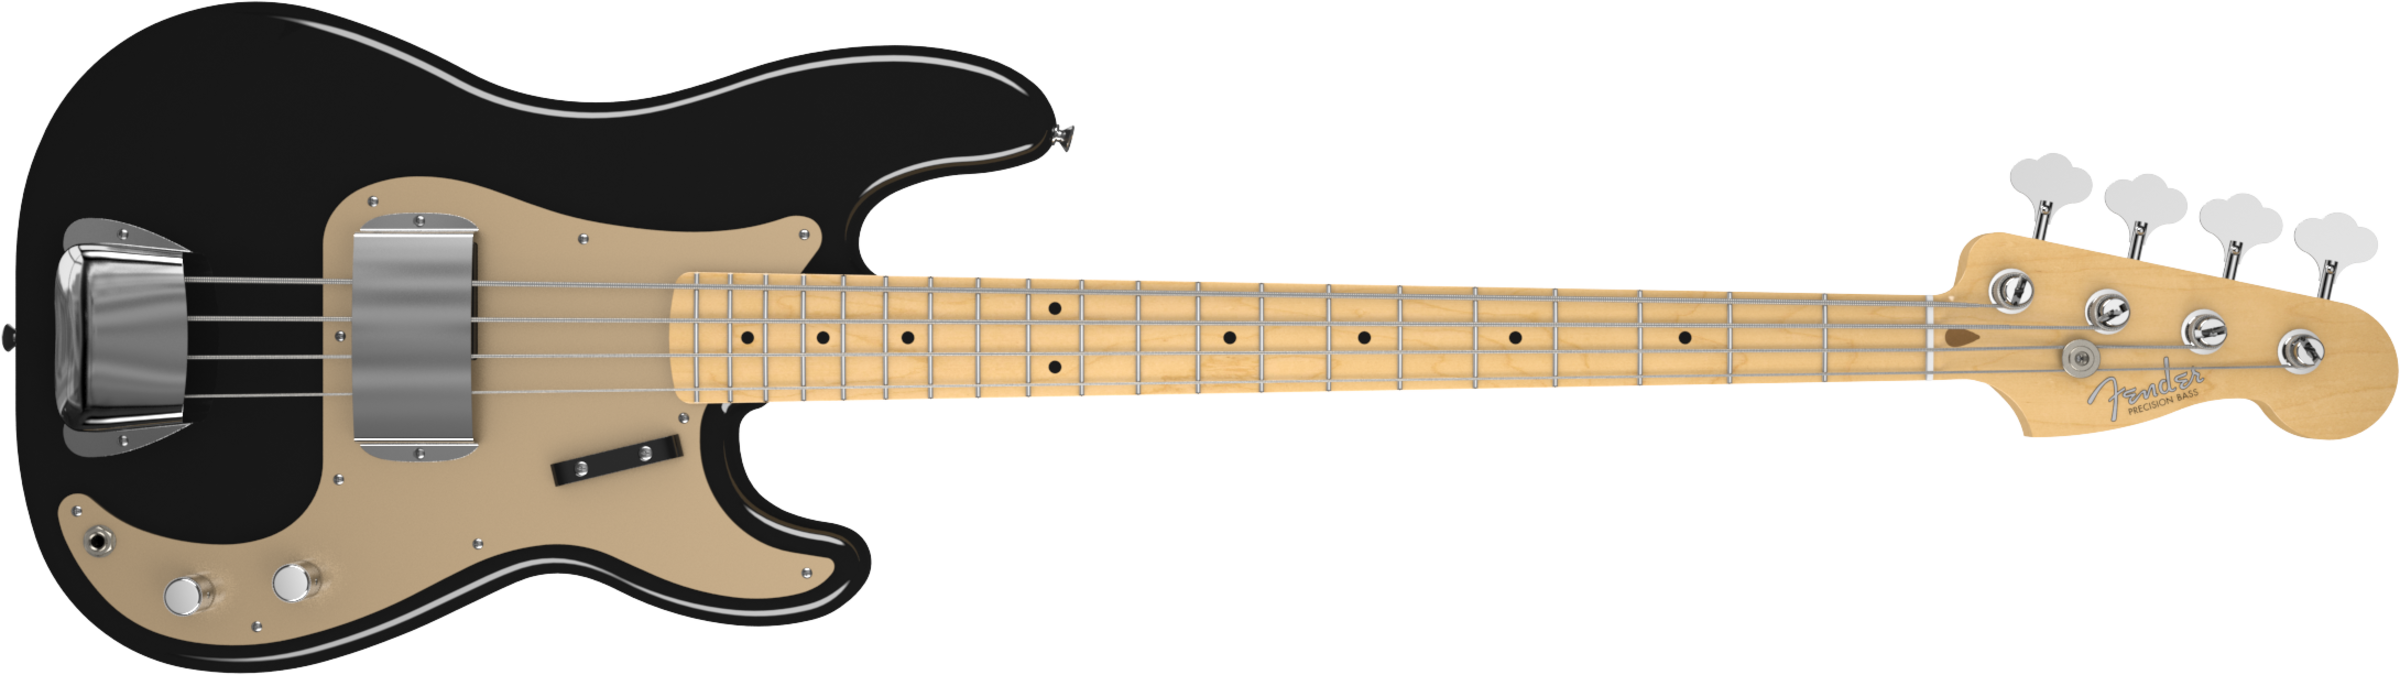 Fender American Vintage 58 Precision Bass Acoustic Bass Guitar Acoustic Bass Fender American Vintage